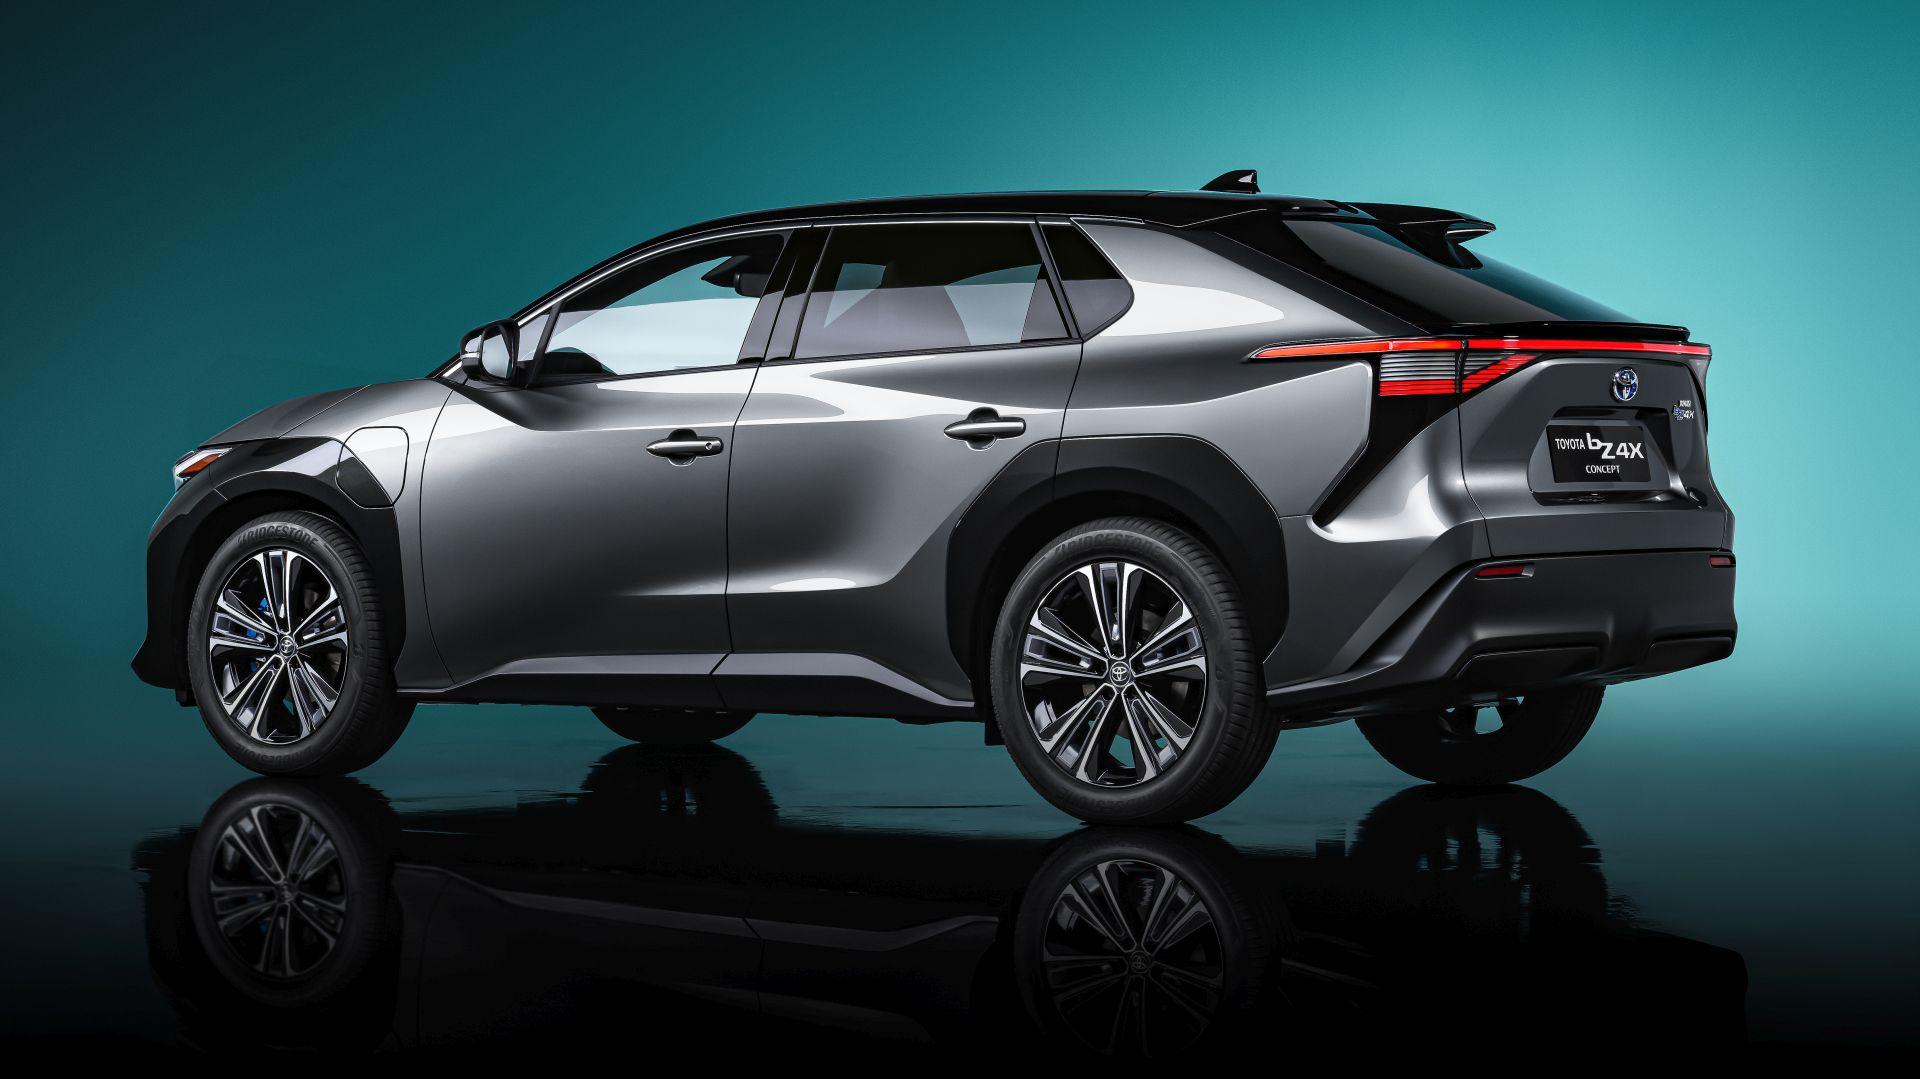 Toyota konceptom bZ4X najavljuje potpuno električne modele